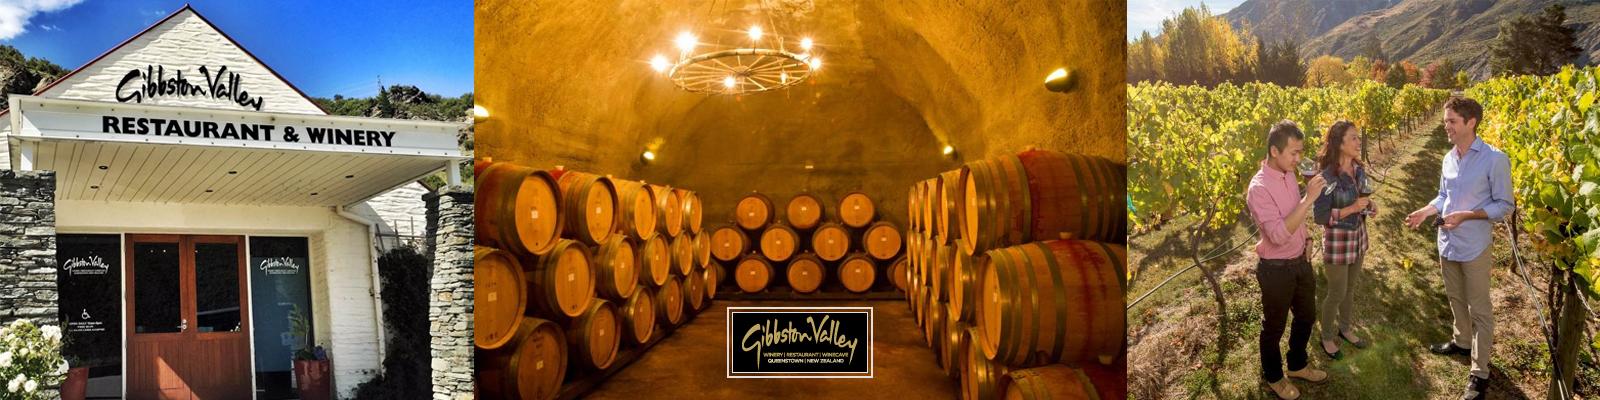 banner-gibbston-valley-winery.jpg